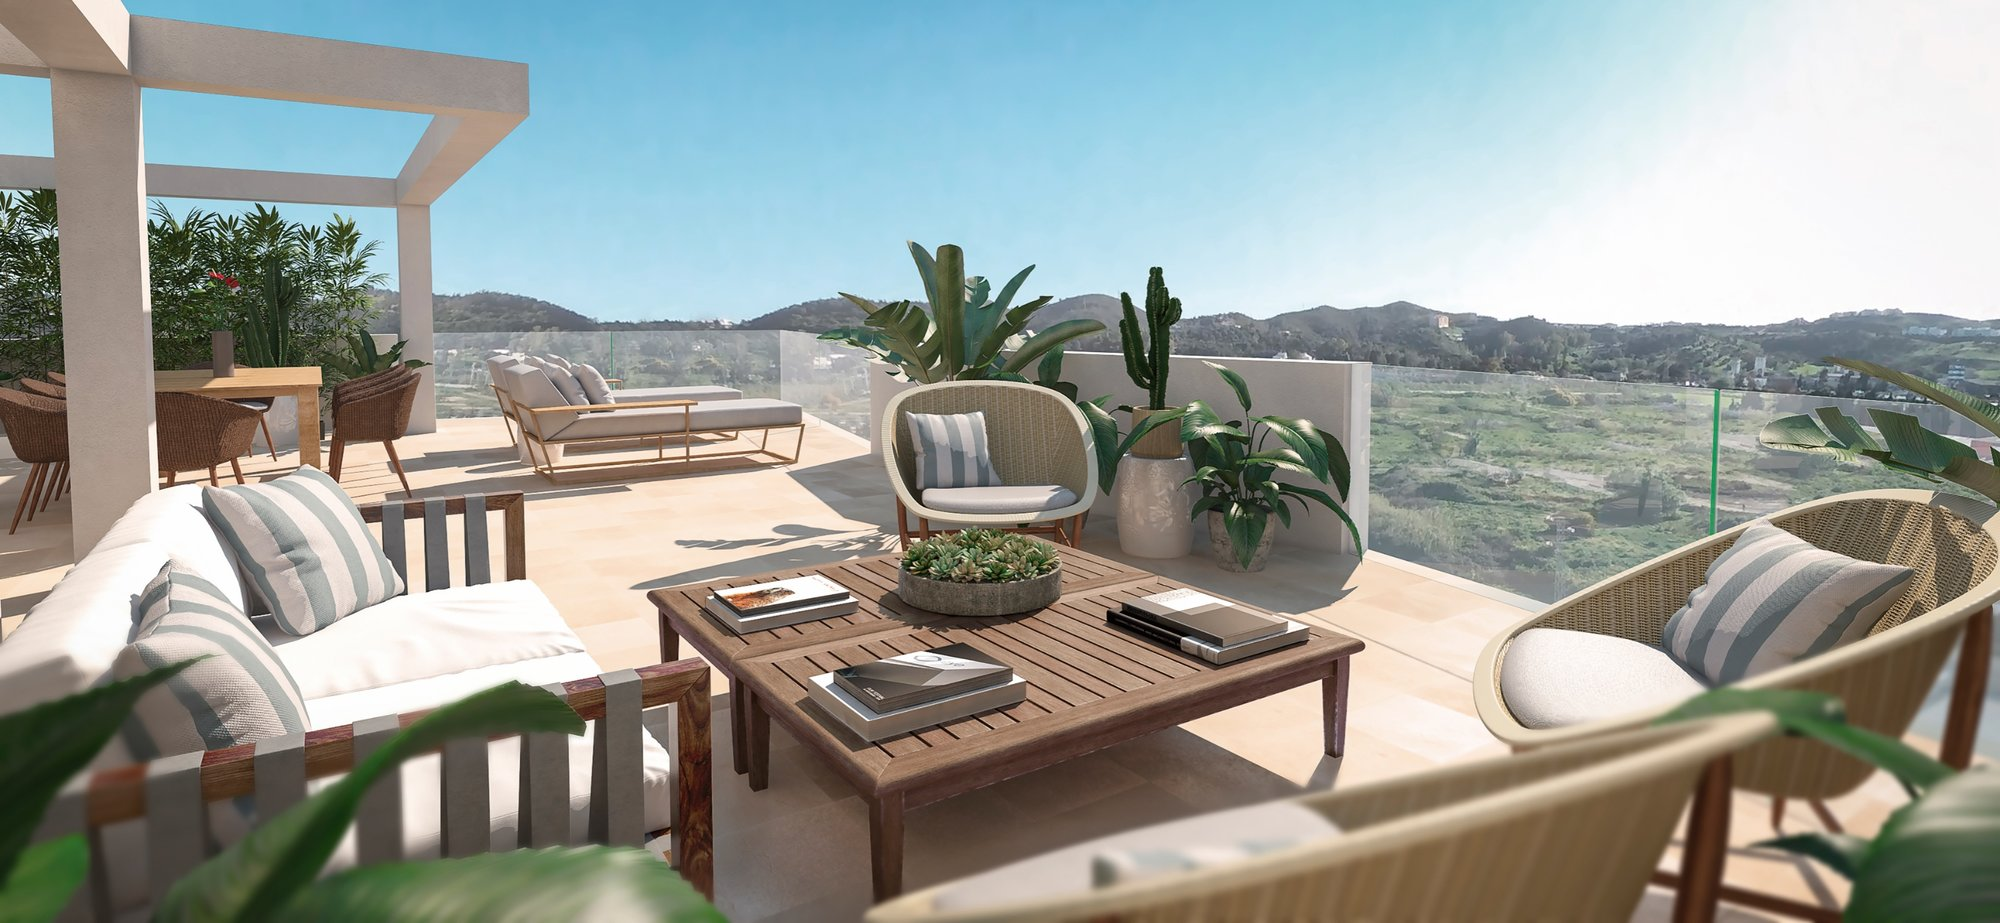 Apartment for sale in Fuengirola, Fuengirola Center